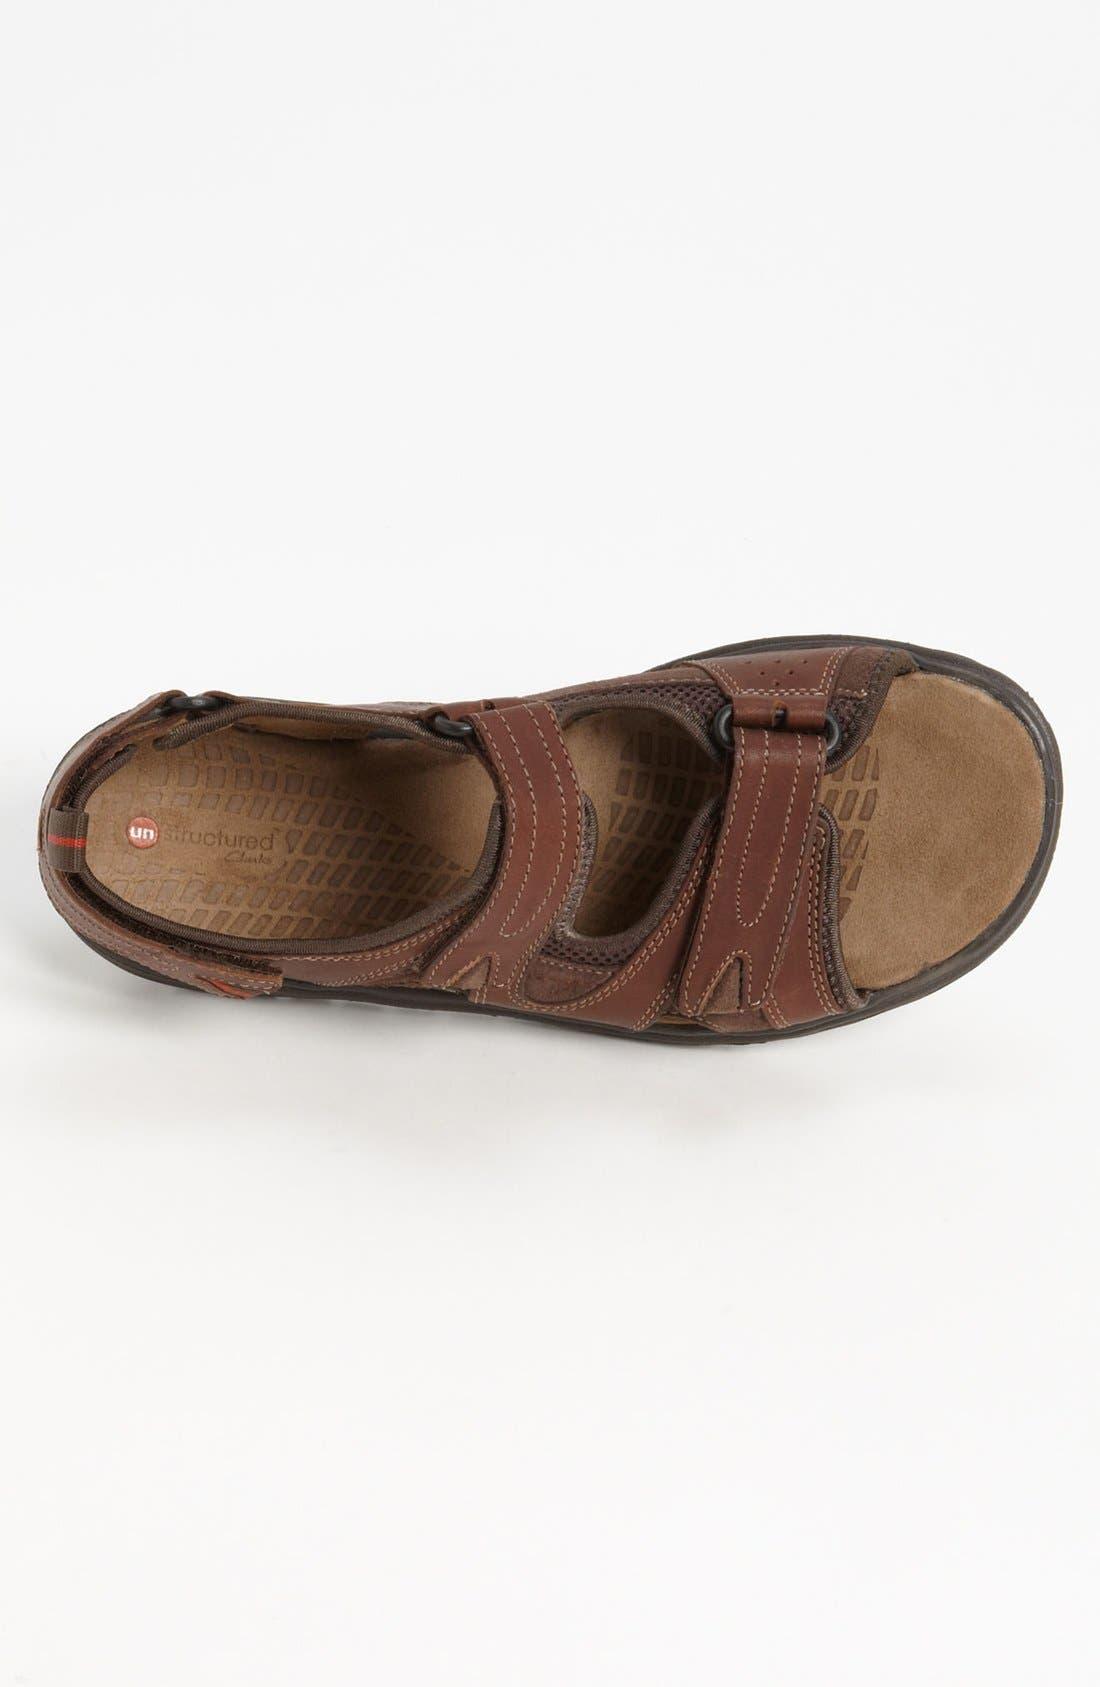 Alternate Image 3  - Clarks® 'Unstructured - Caicos' Sandal   (Men)